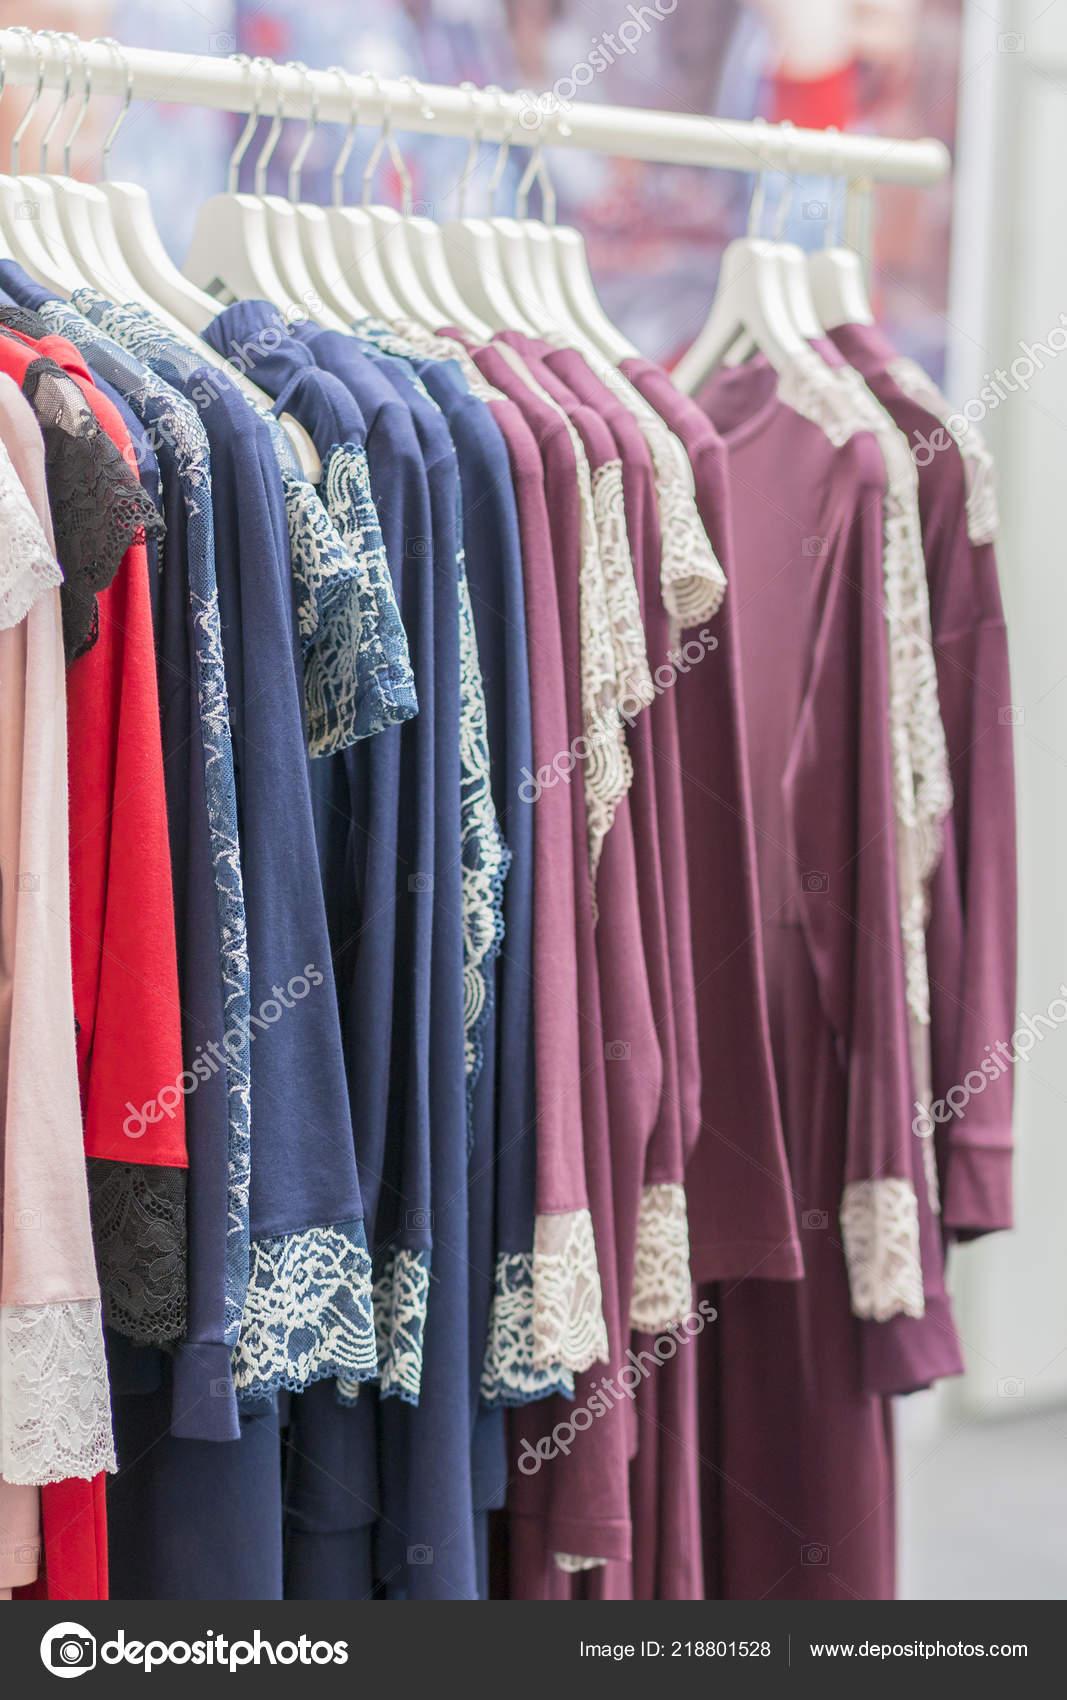 Kleding Winkels Dames.Kleding Verkoopt Concept Dames Pyjama Op Hangers In Kleding Winkel